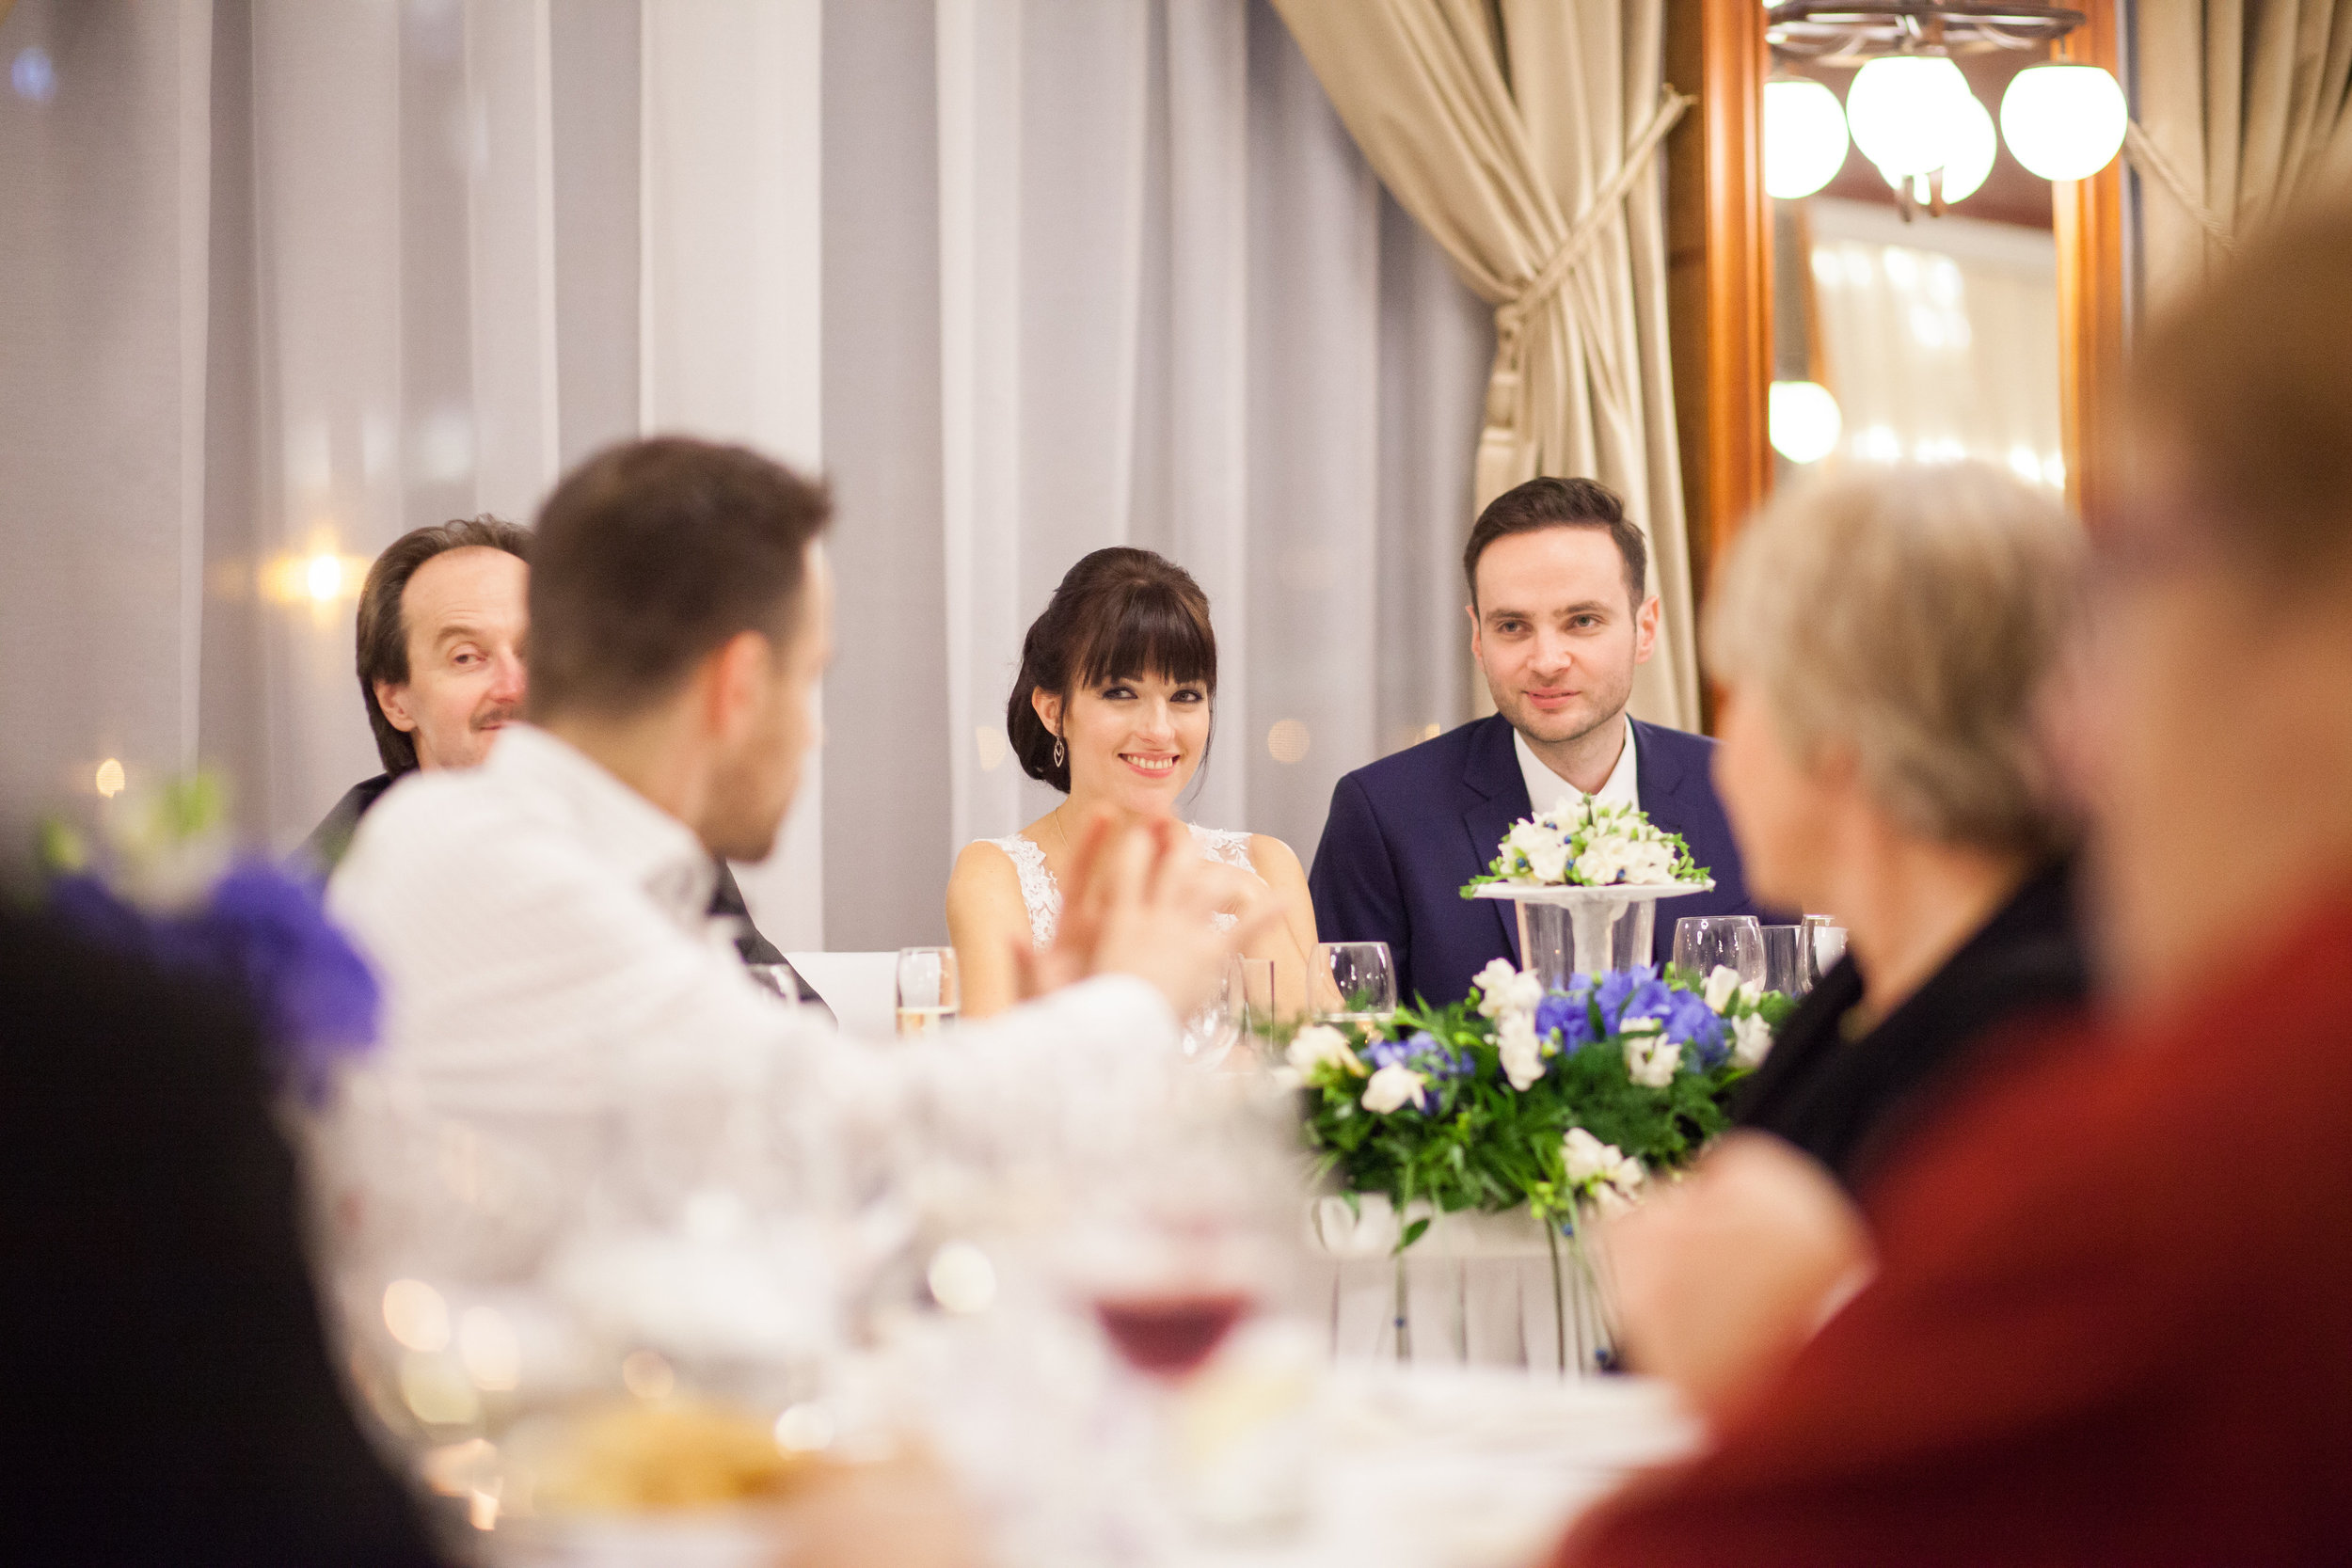 destination-wedding-photographer-slovakia-bratislava-reception-hotel-devin-8.jpg